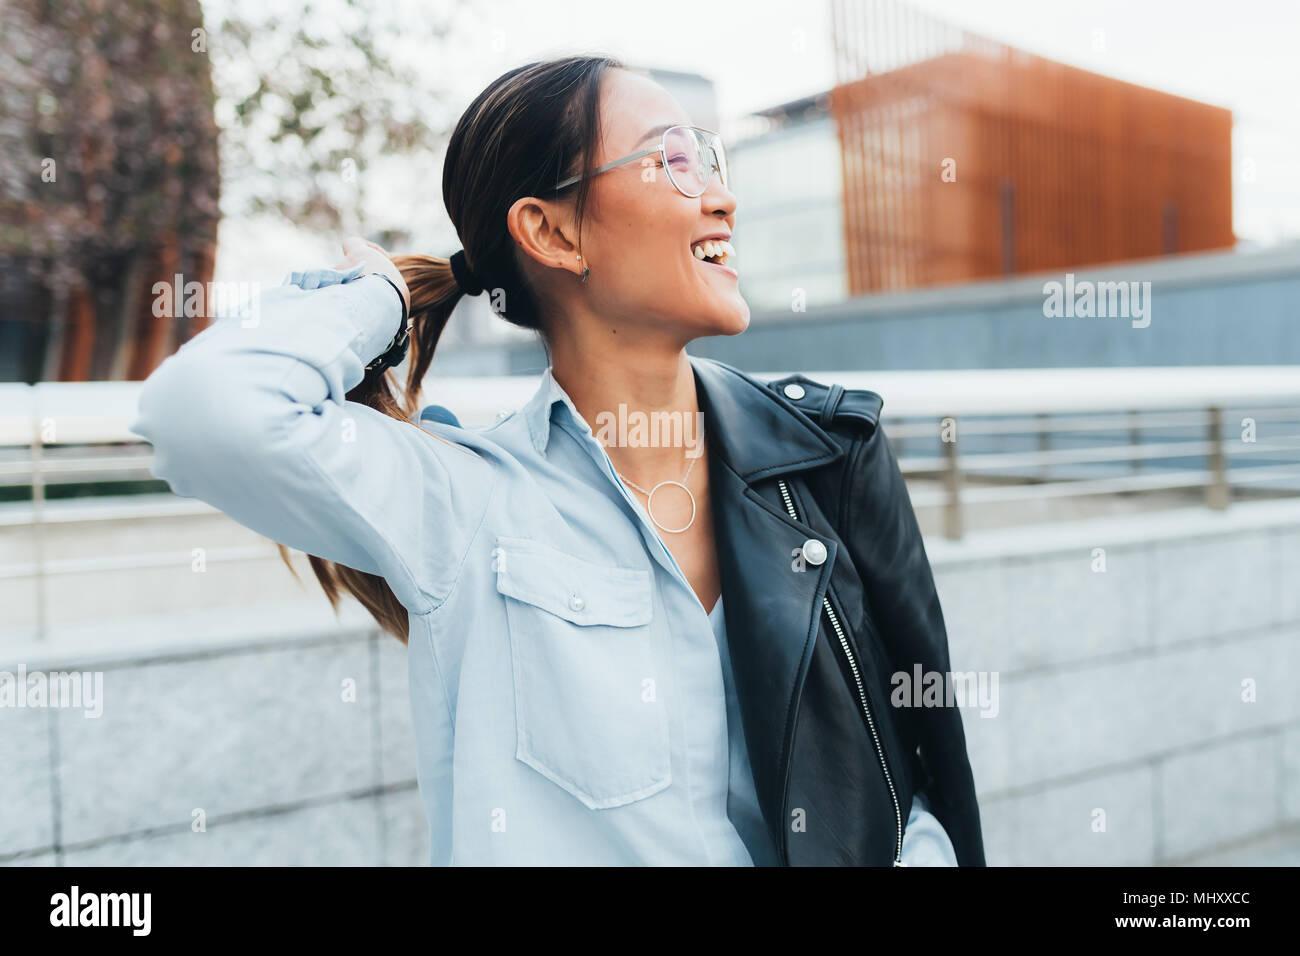 4731e2e9c6a0 Portrait of businesswoman outdoors